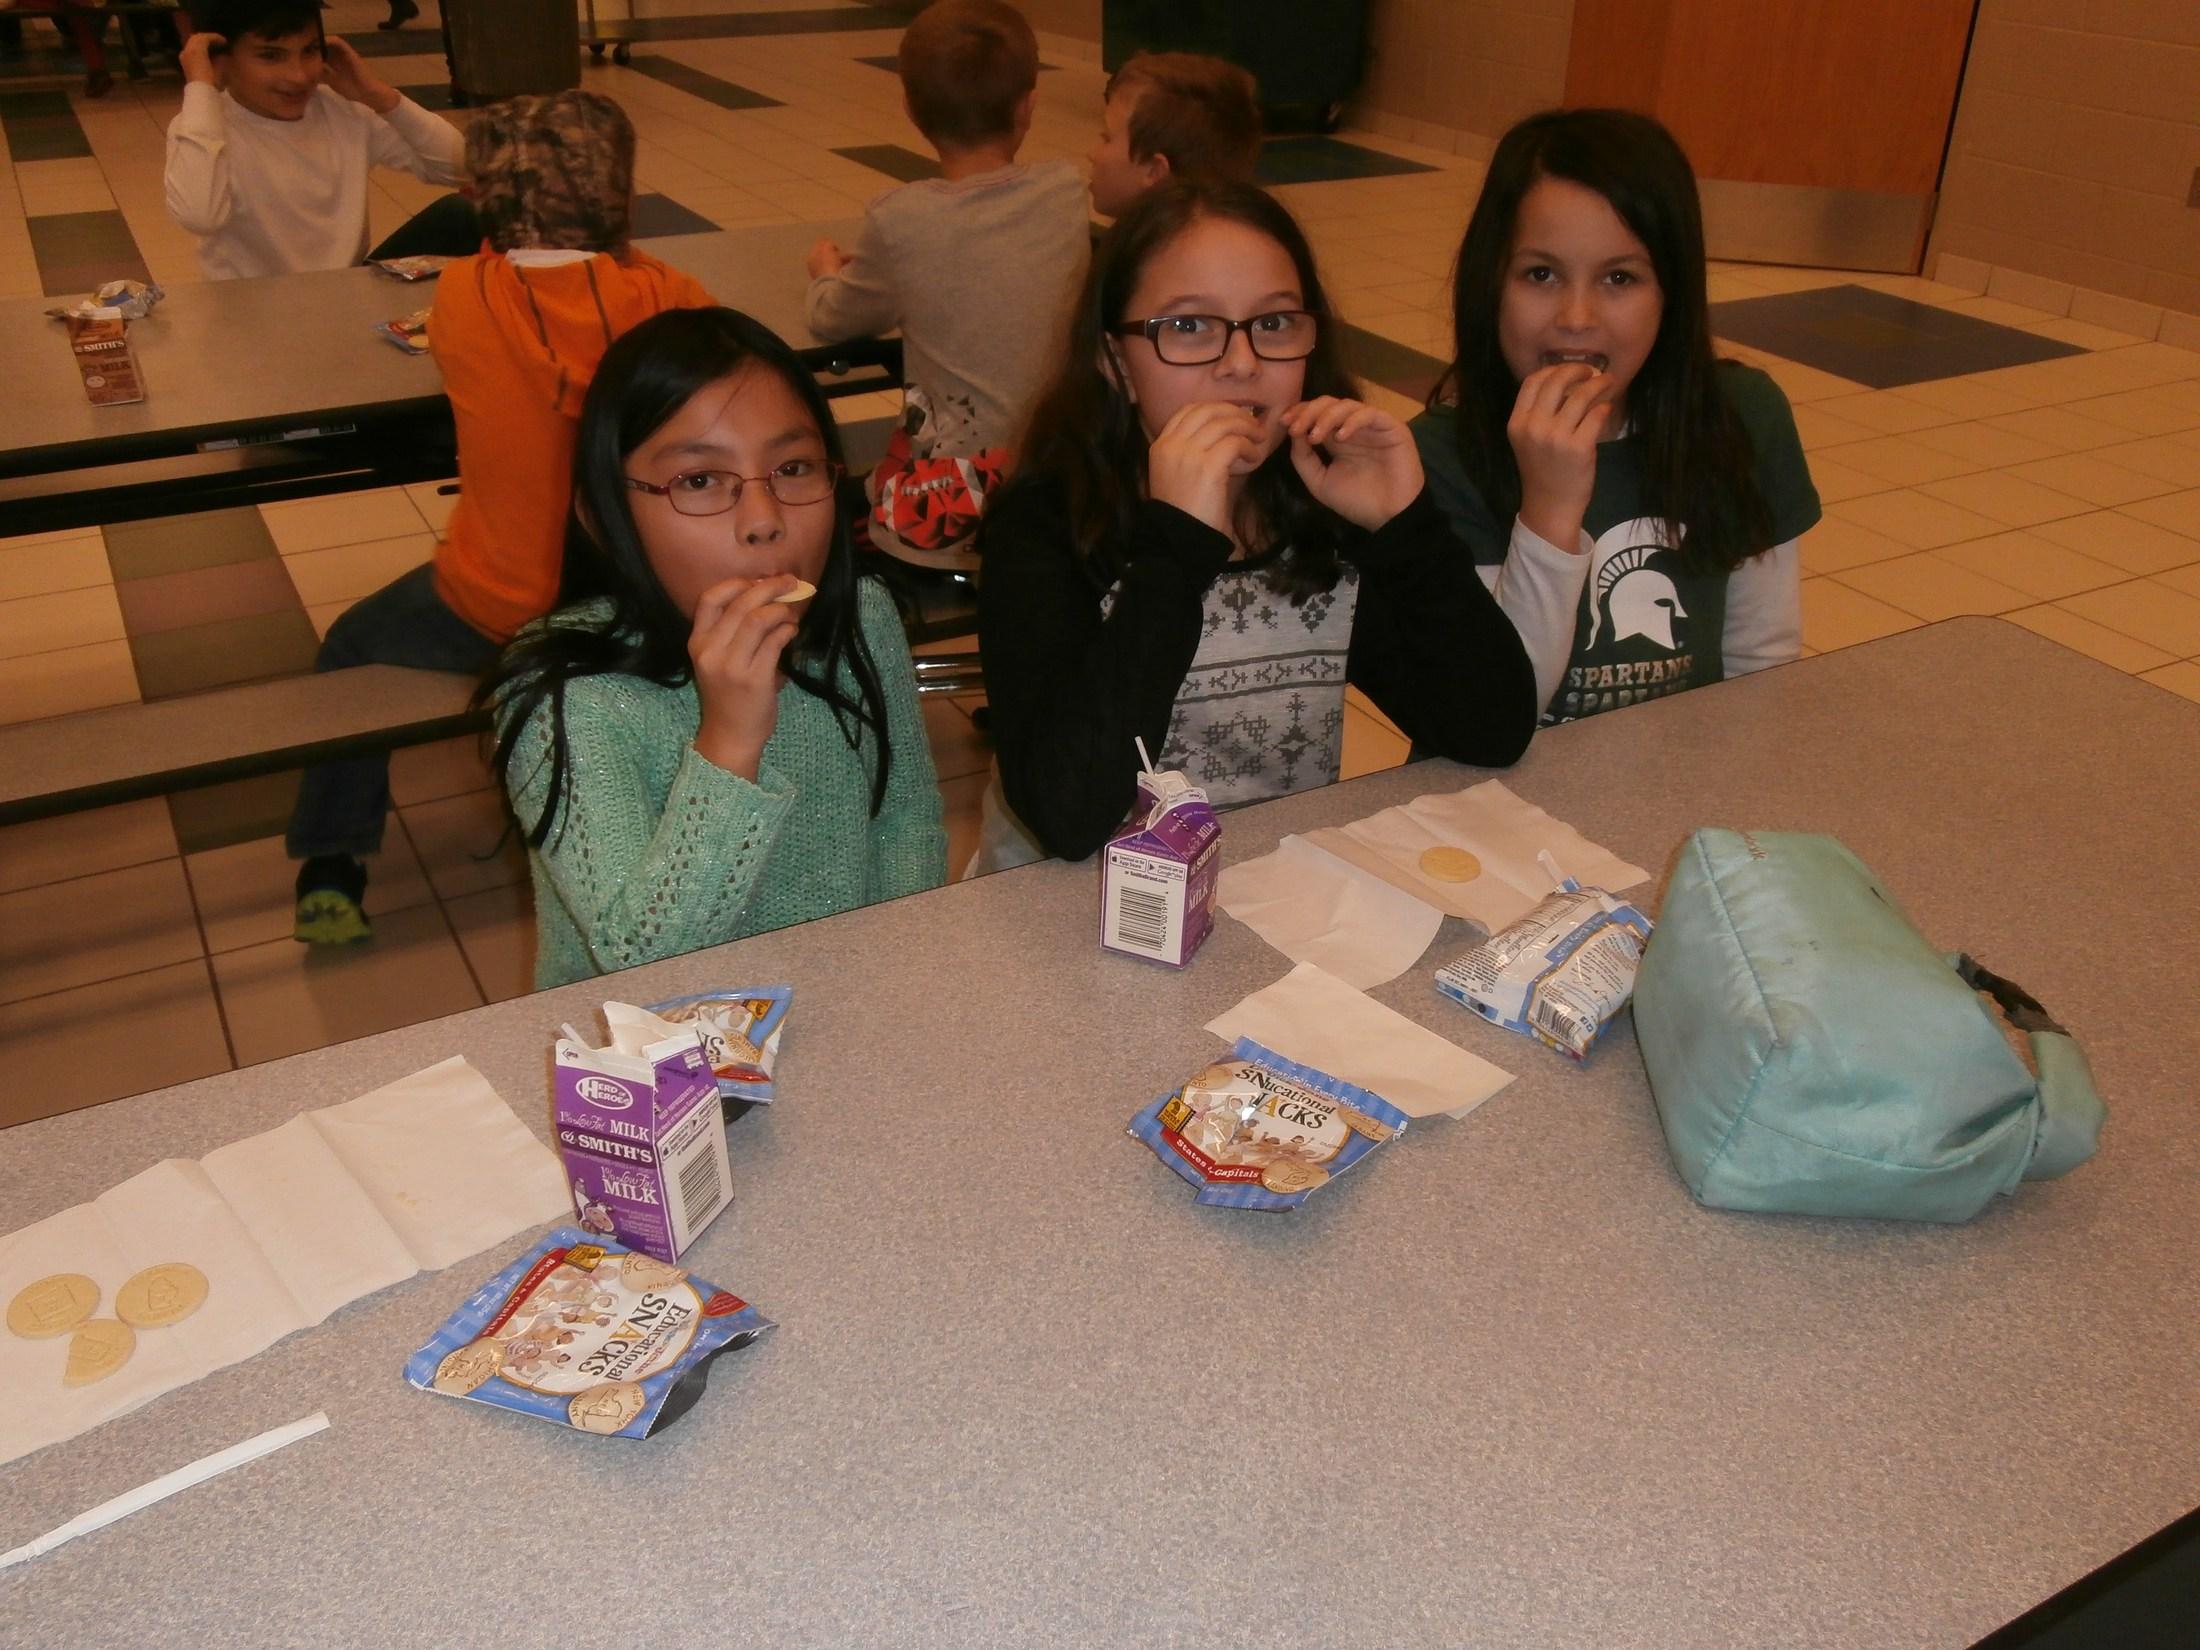 Three girls eating snack.